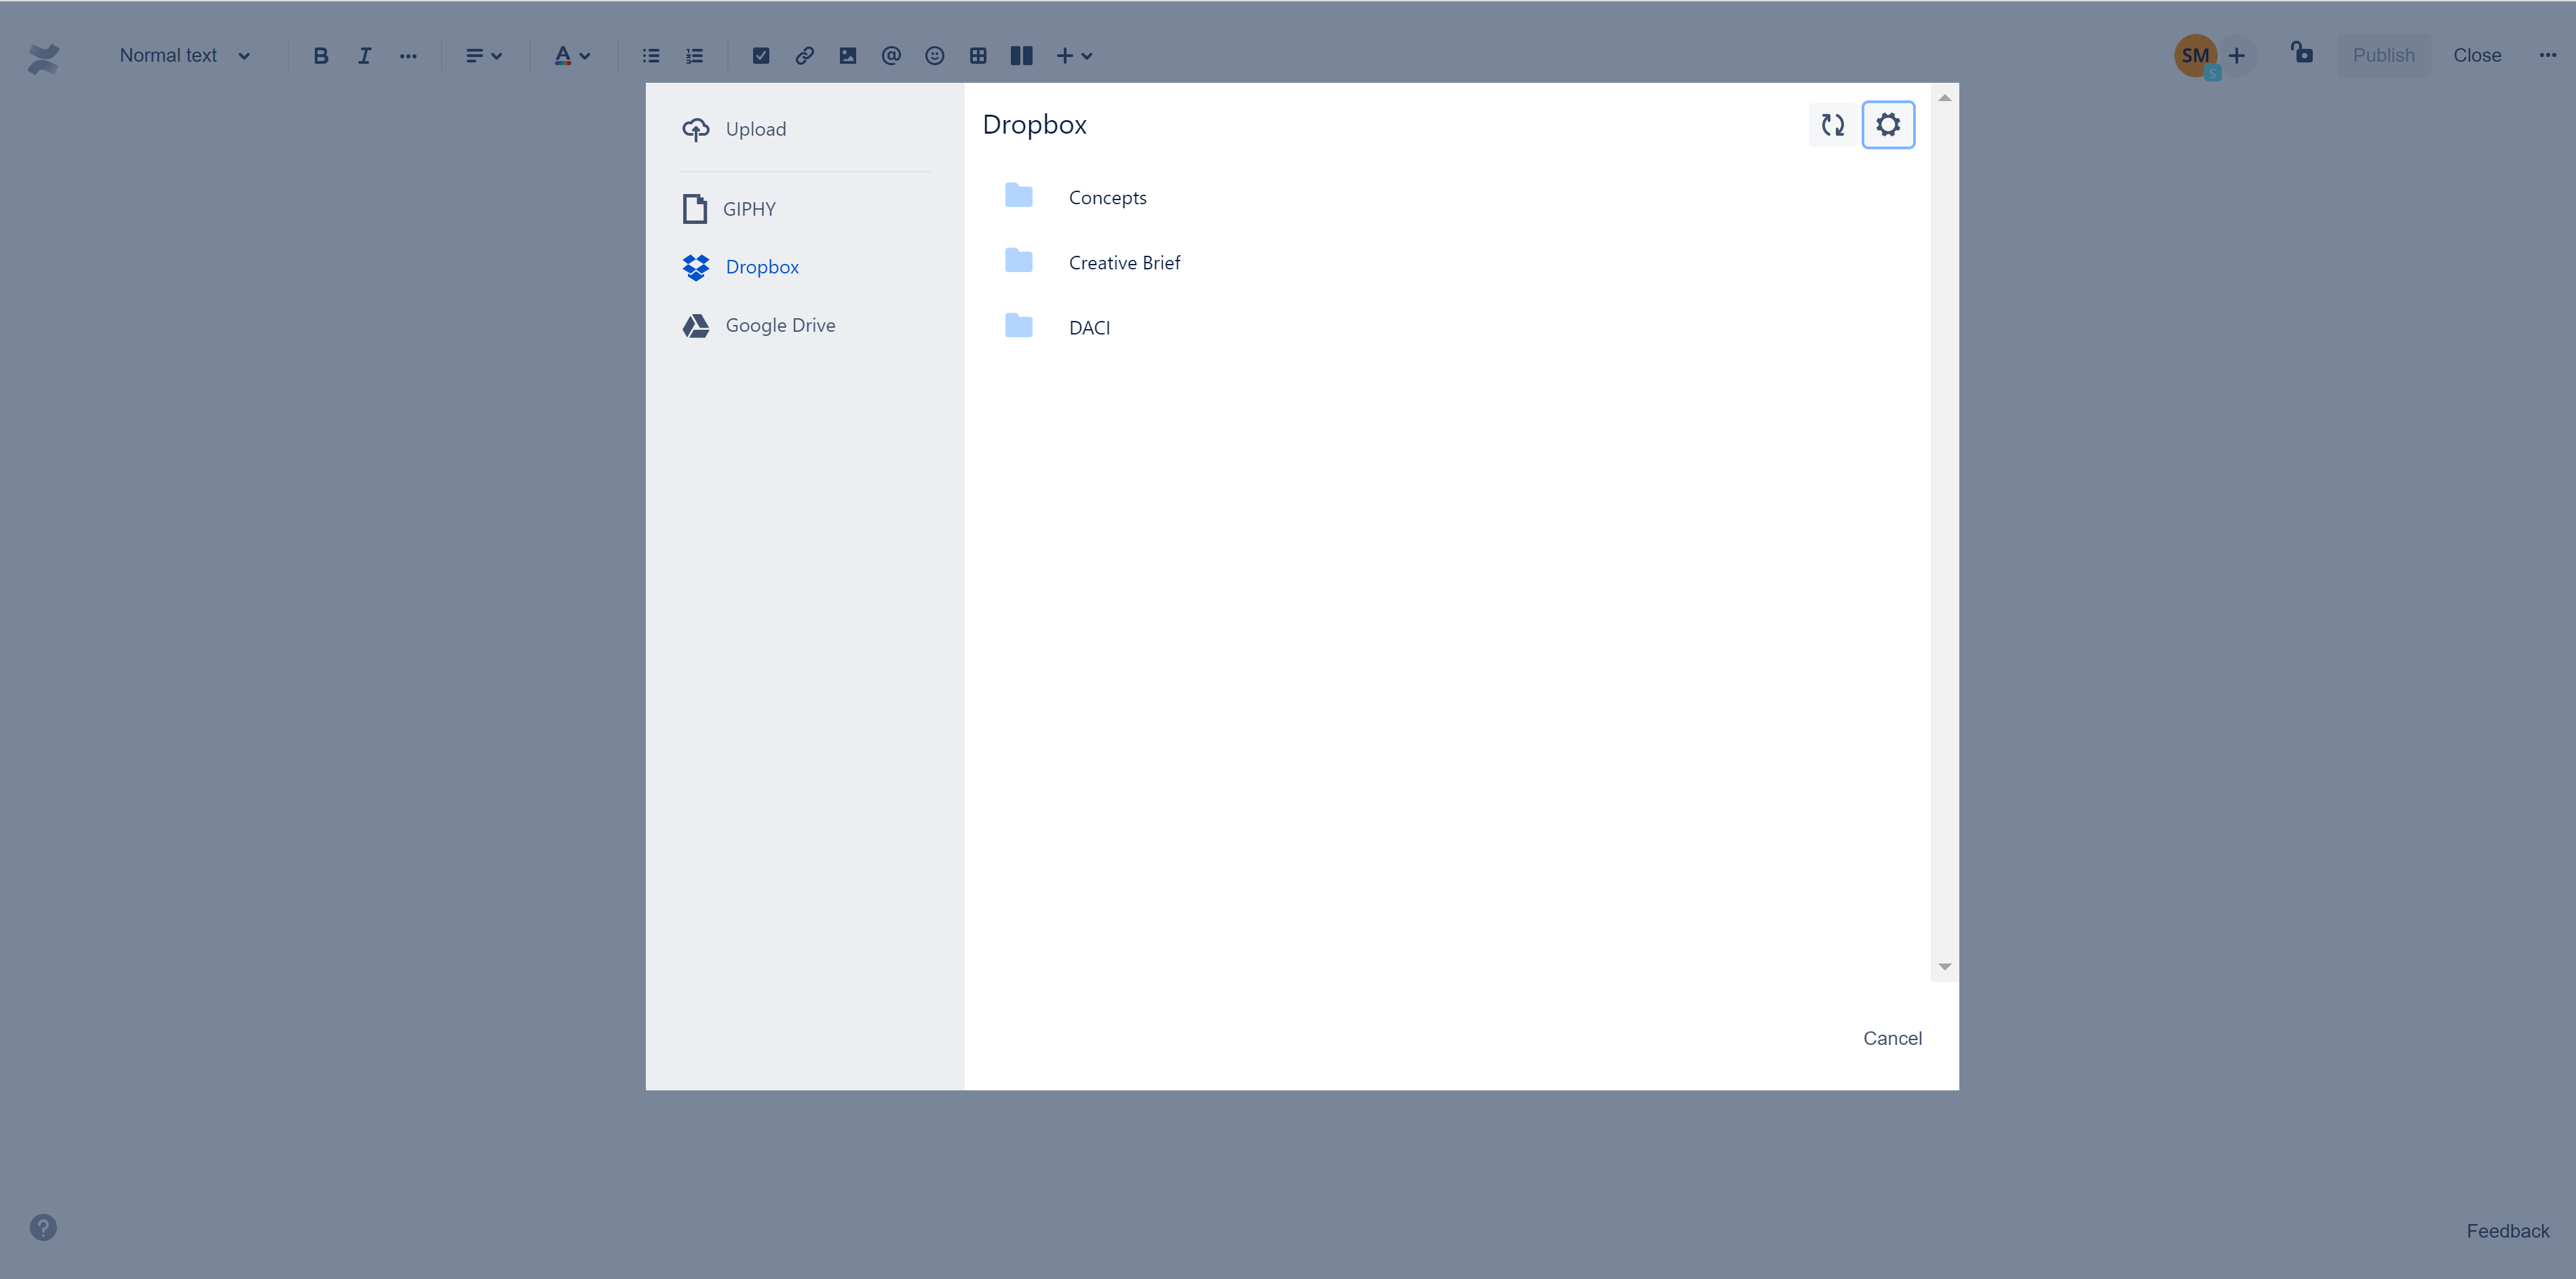 Confluence Dropbox feature